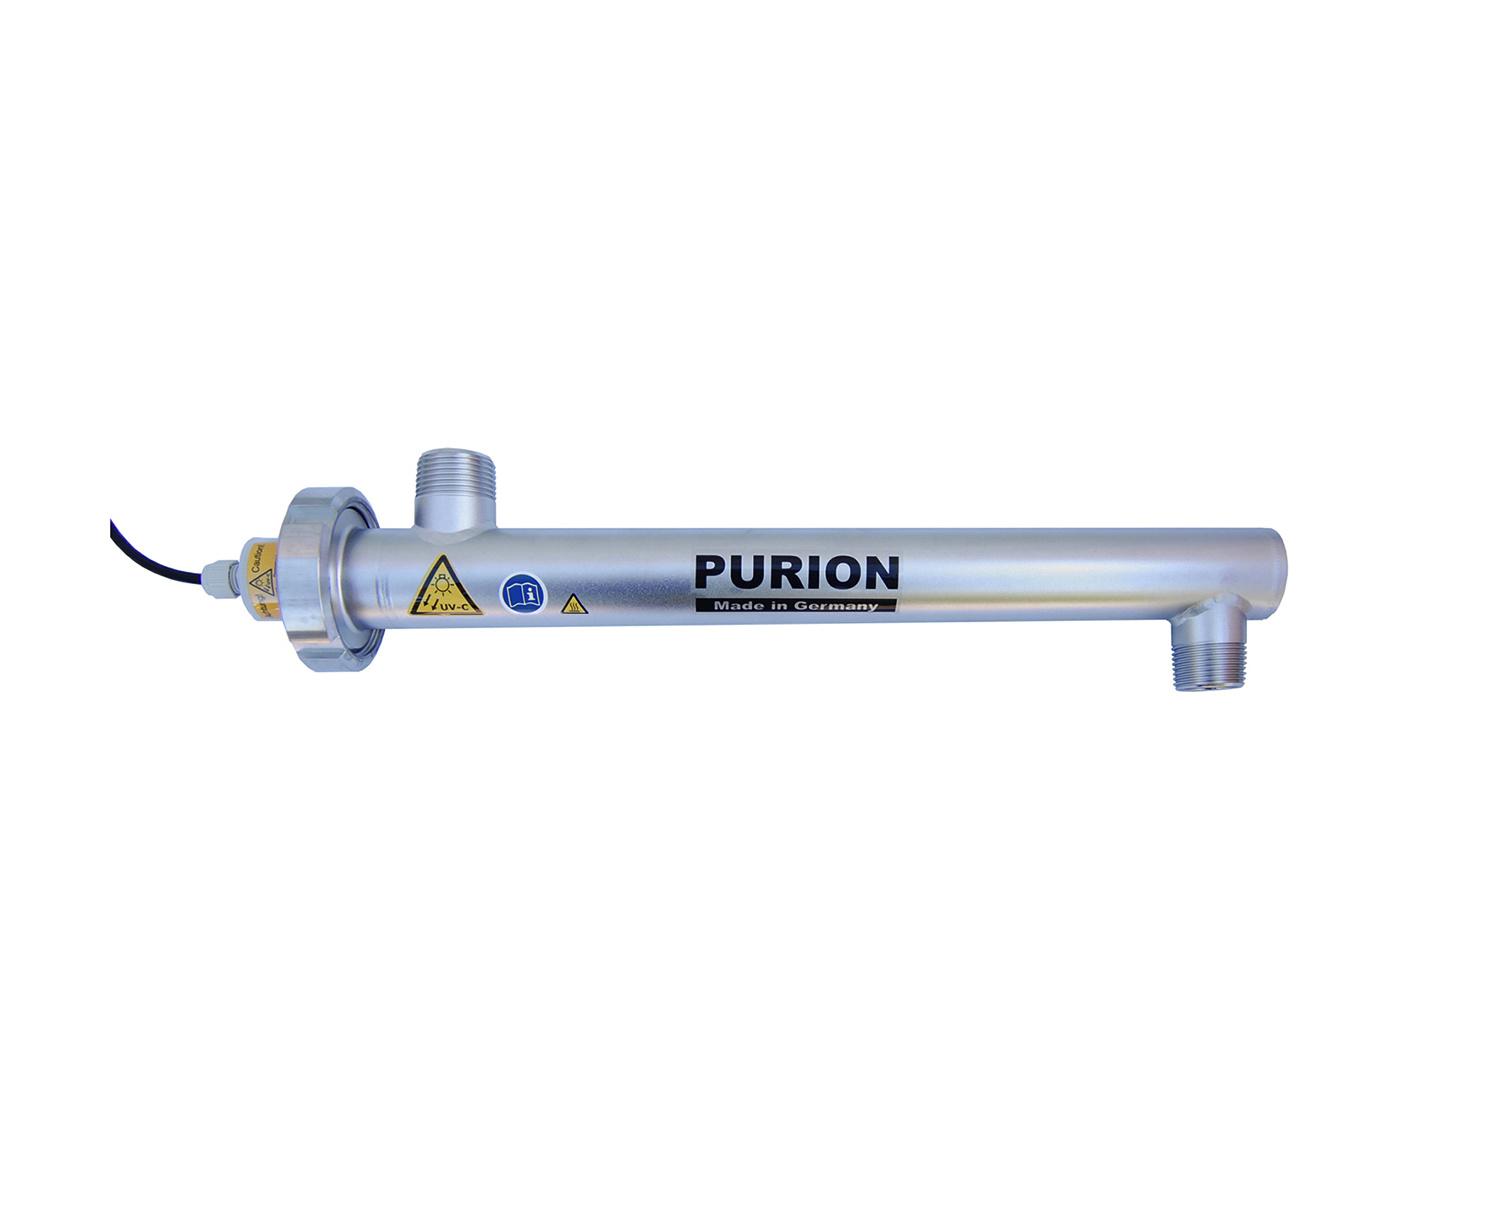 Purion Purion 1000-230VAC-PRO